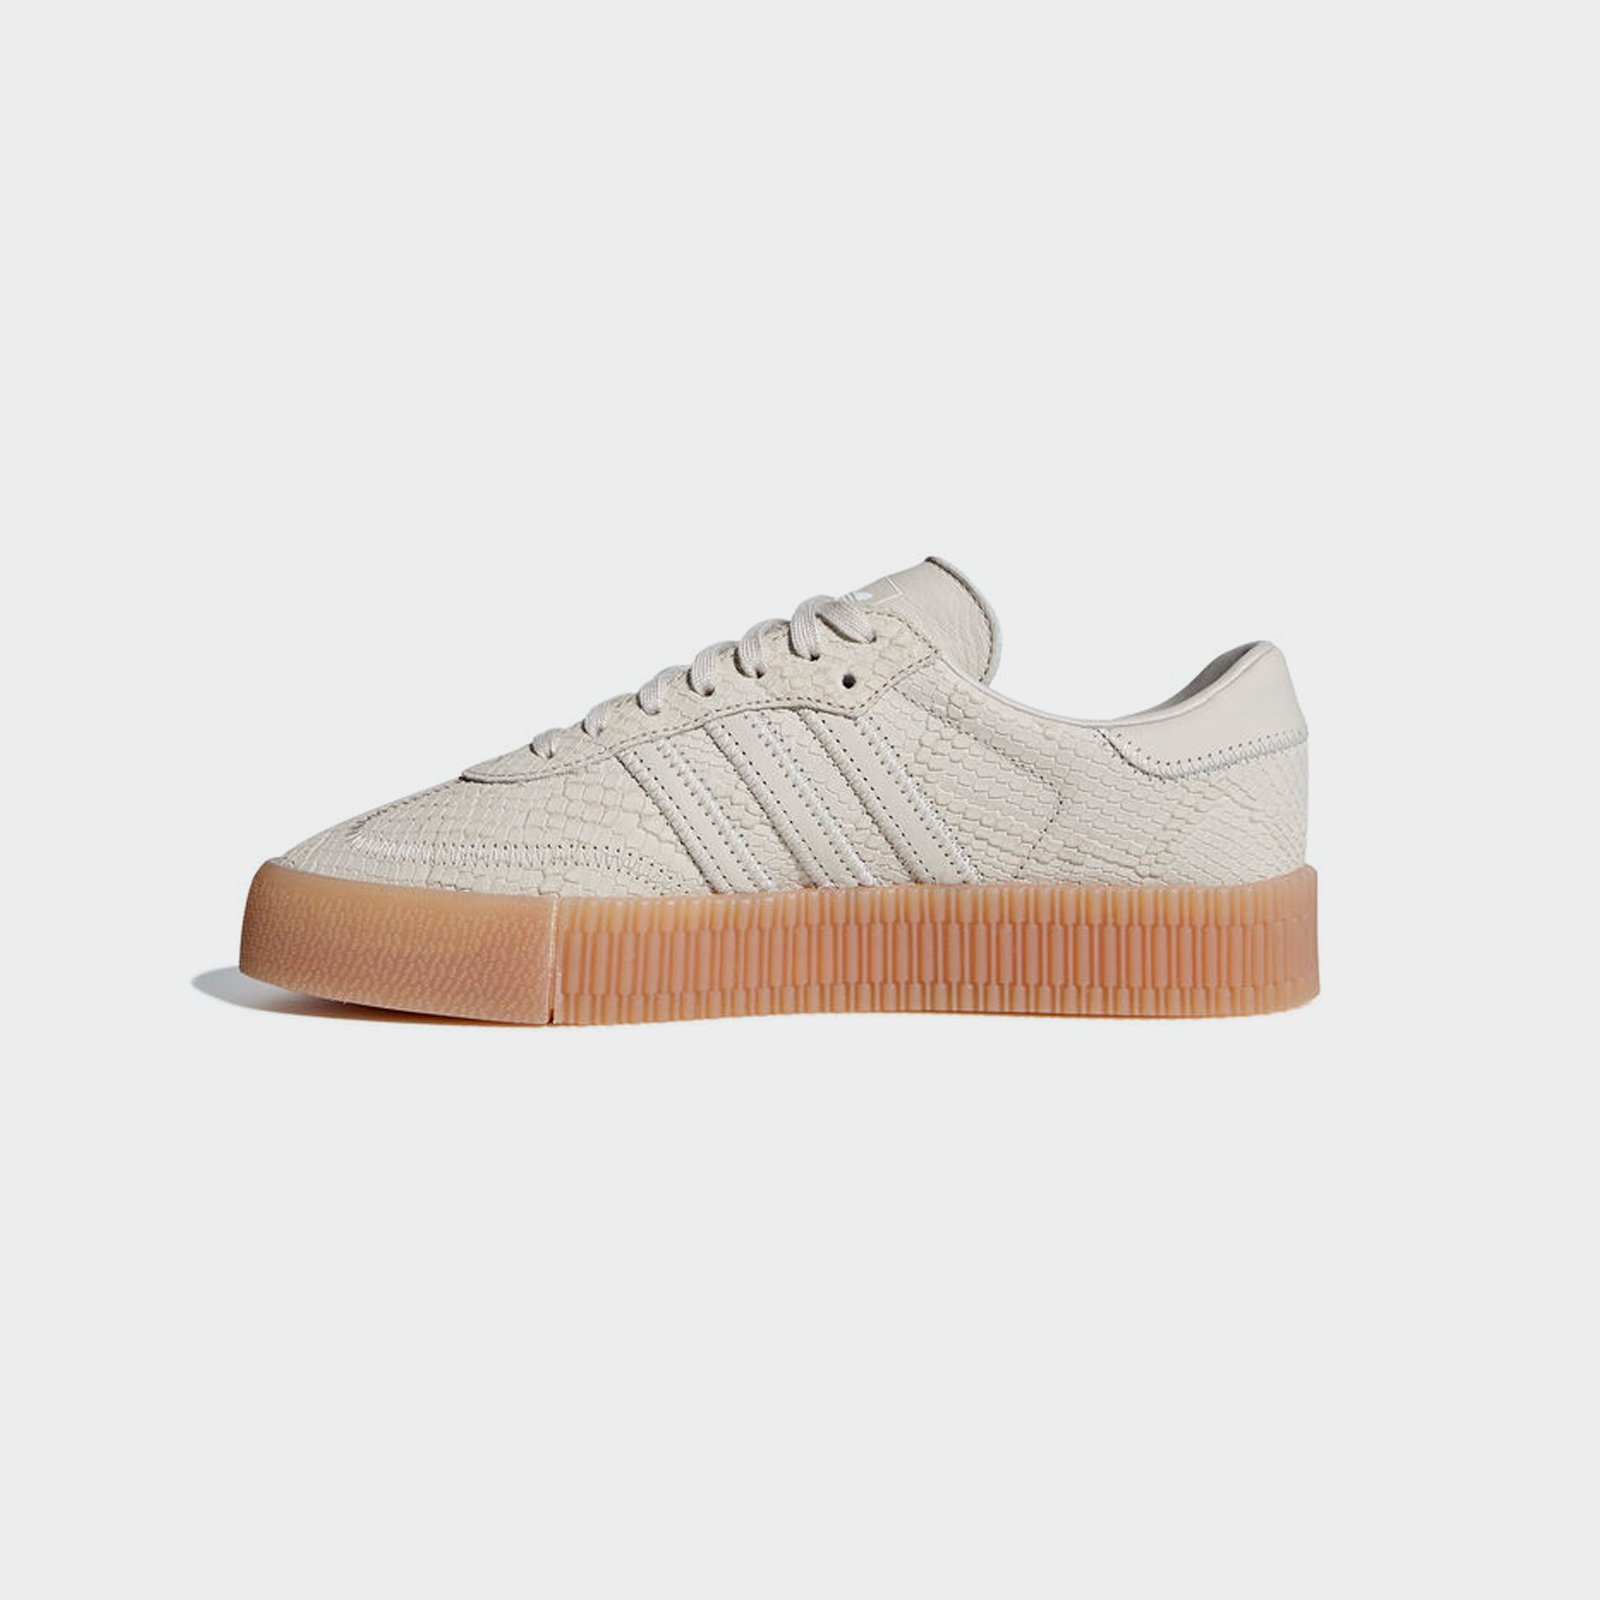 22c8f96c4f9e adidas Sambarose W - B28163 - Sneakersnstuff